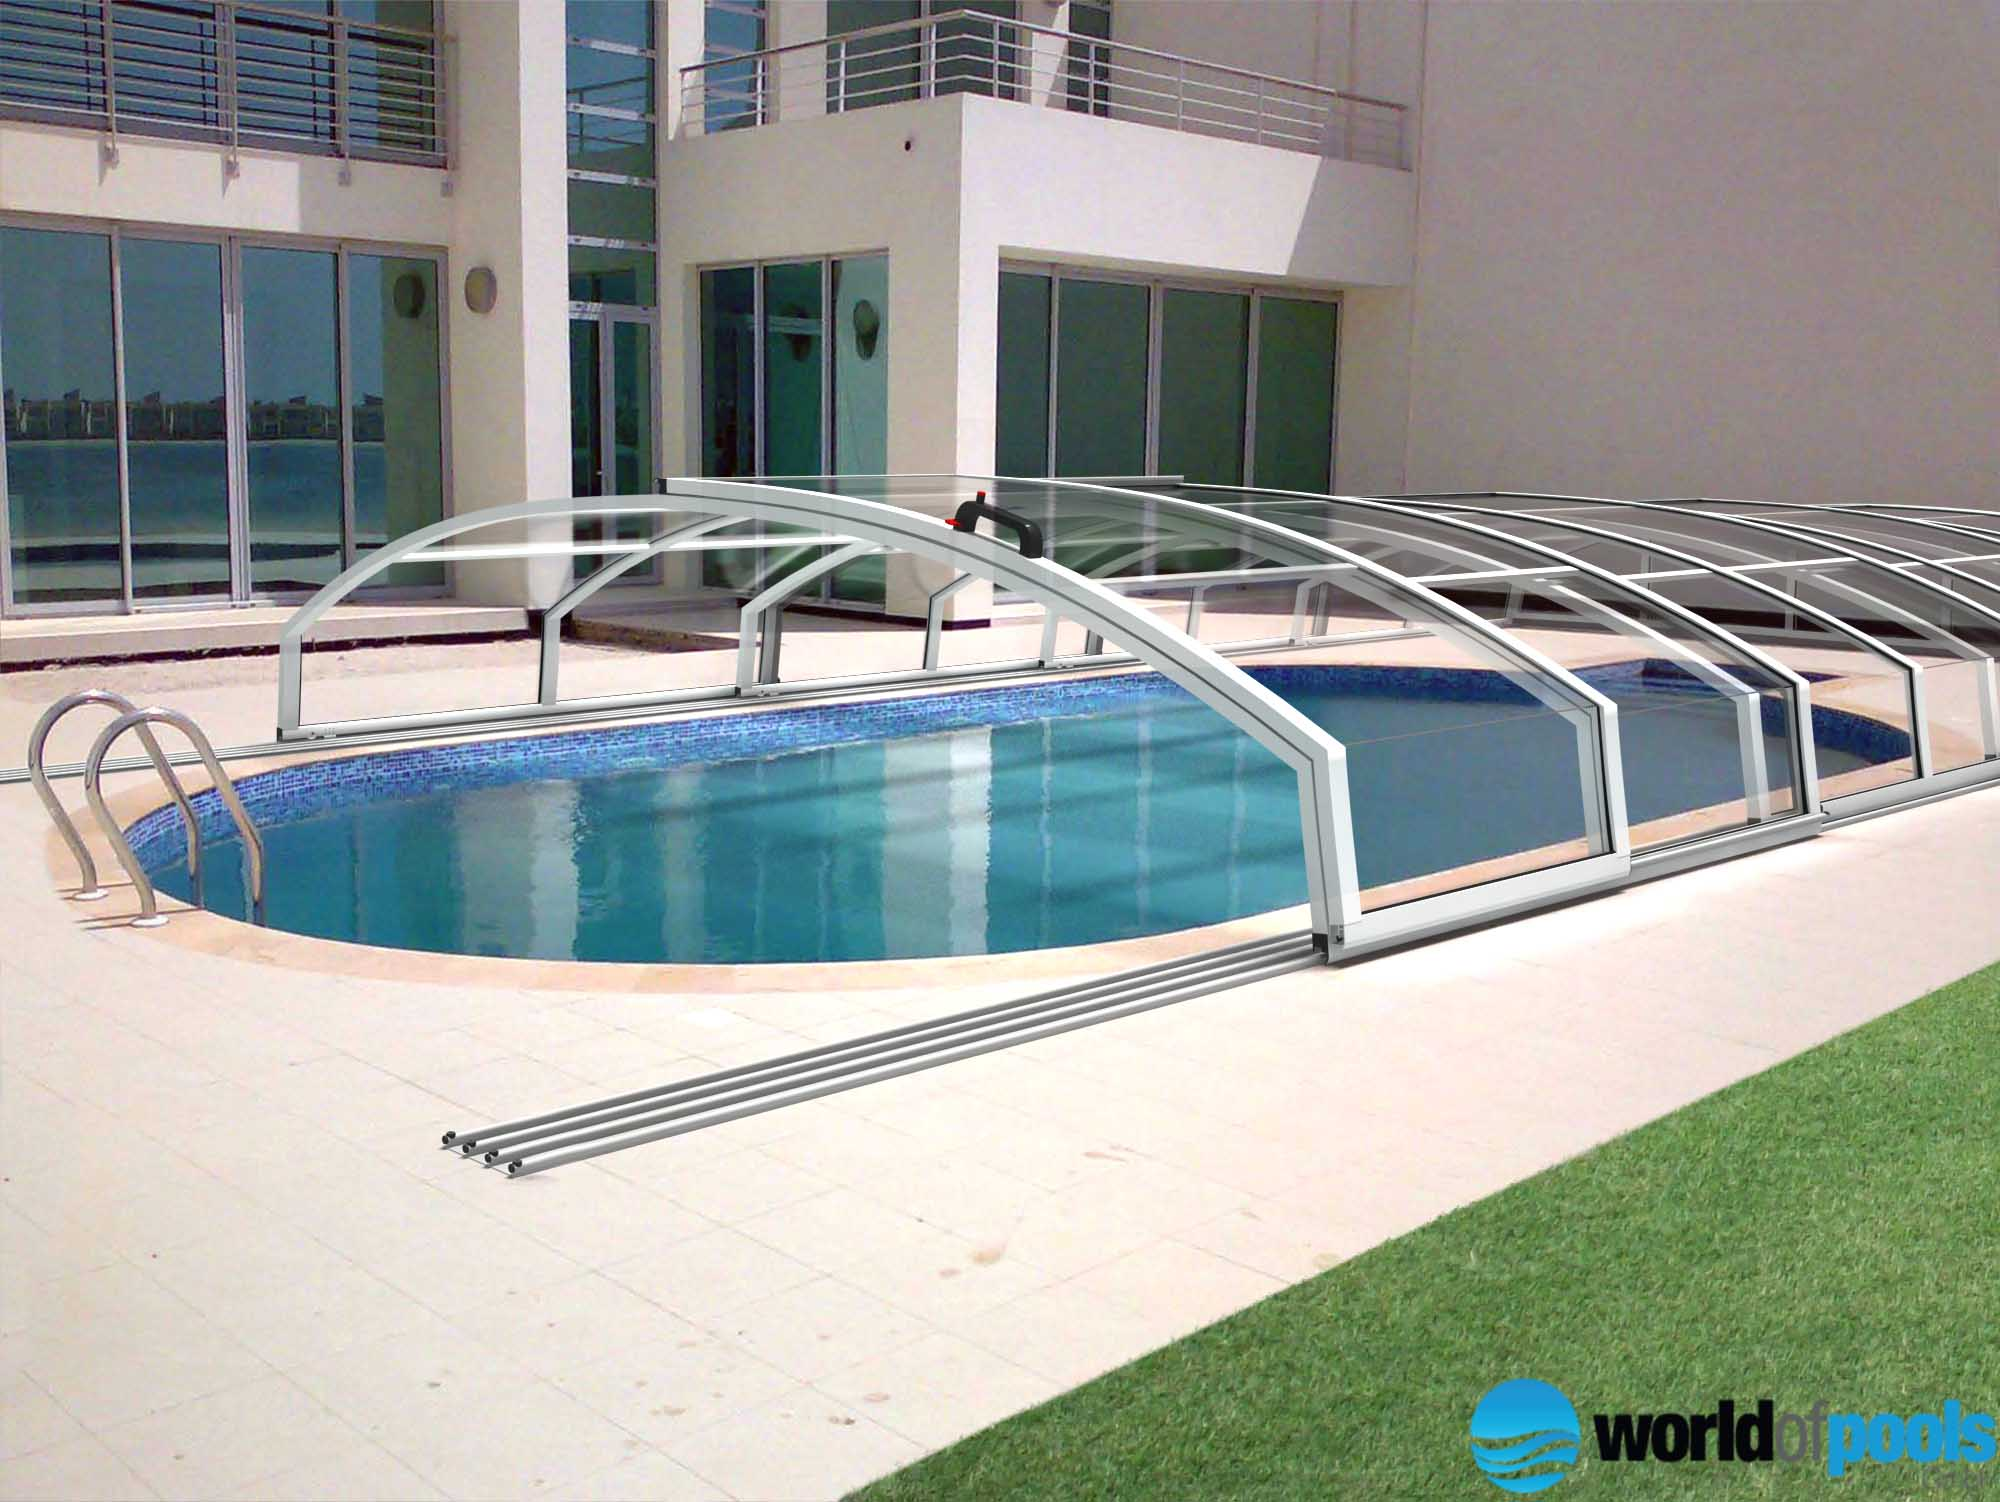 angebot pools f r garten swimmingpools fertigschwimmbecken. Black Bedroom Furniture Sets. Home Design Ideas